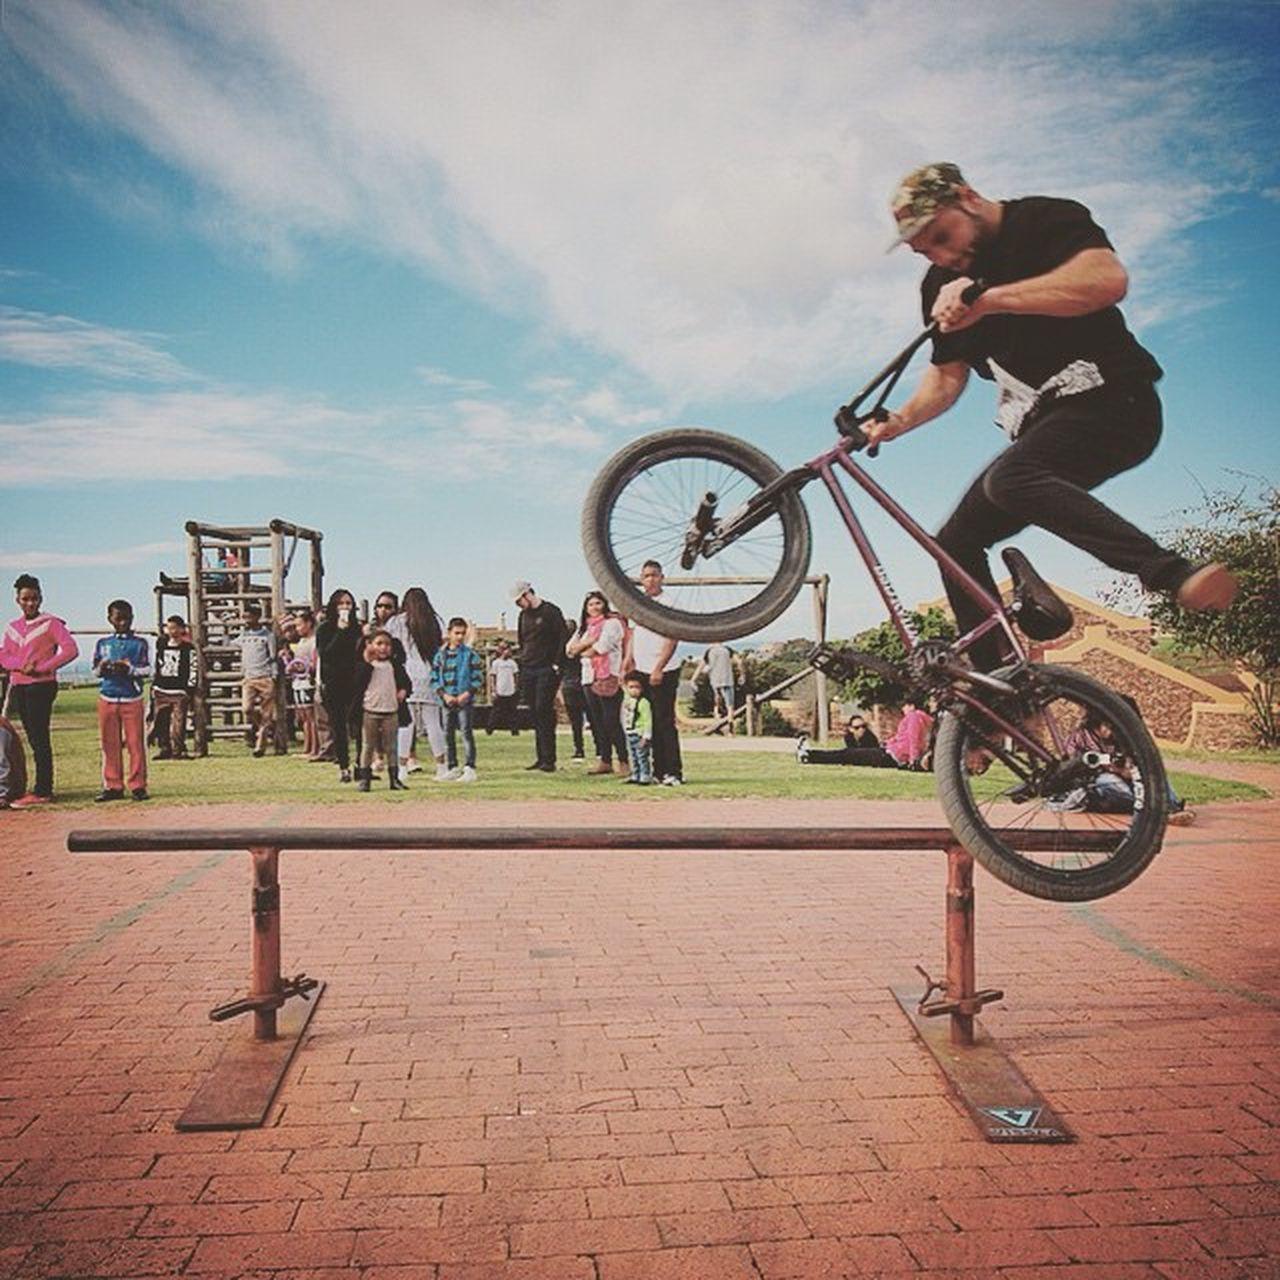 @vinnisilo doing 180 over the rail. Bmx  Rideforgood Talent Shooteditsleeprepeat Rebelmediaguys Bmxplore